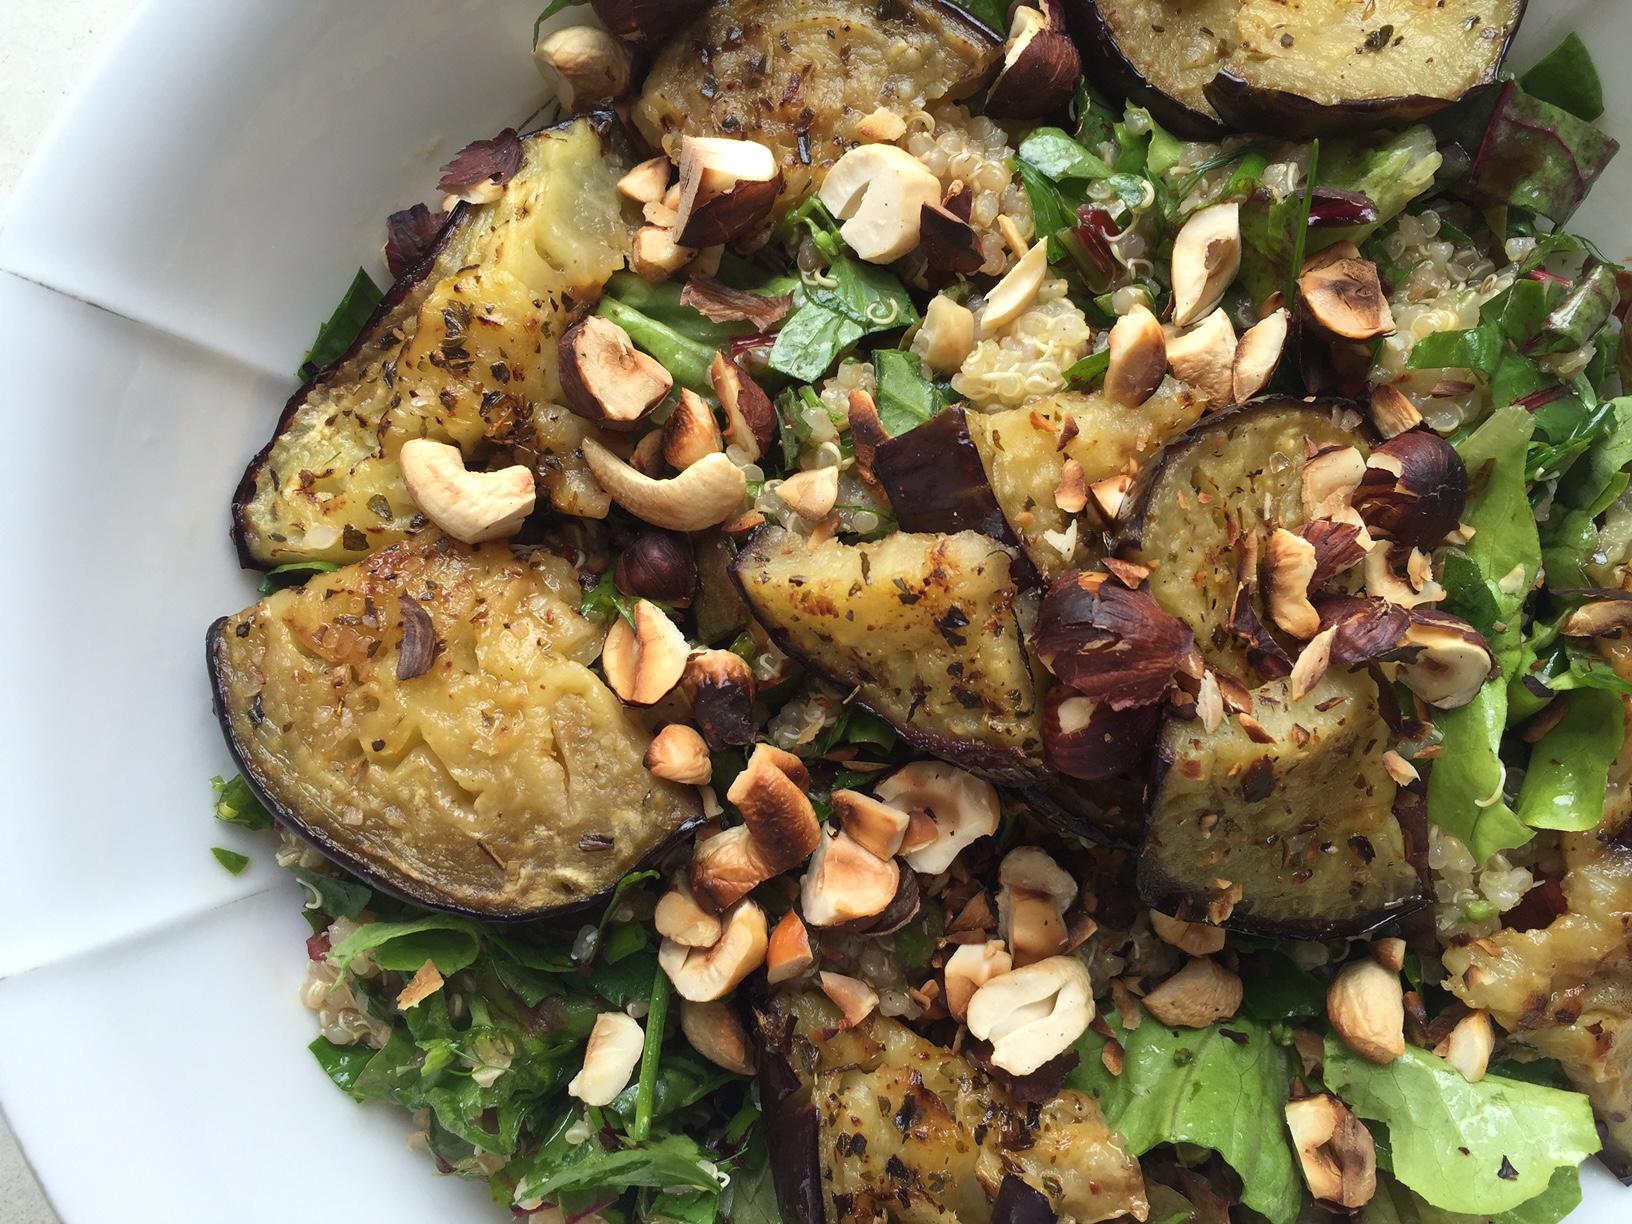 Melanzani gebraten auf Quinoa Kräuter Salat_Nina Mandl TCM.JPG